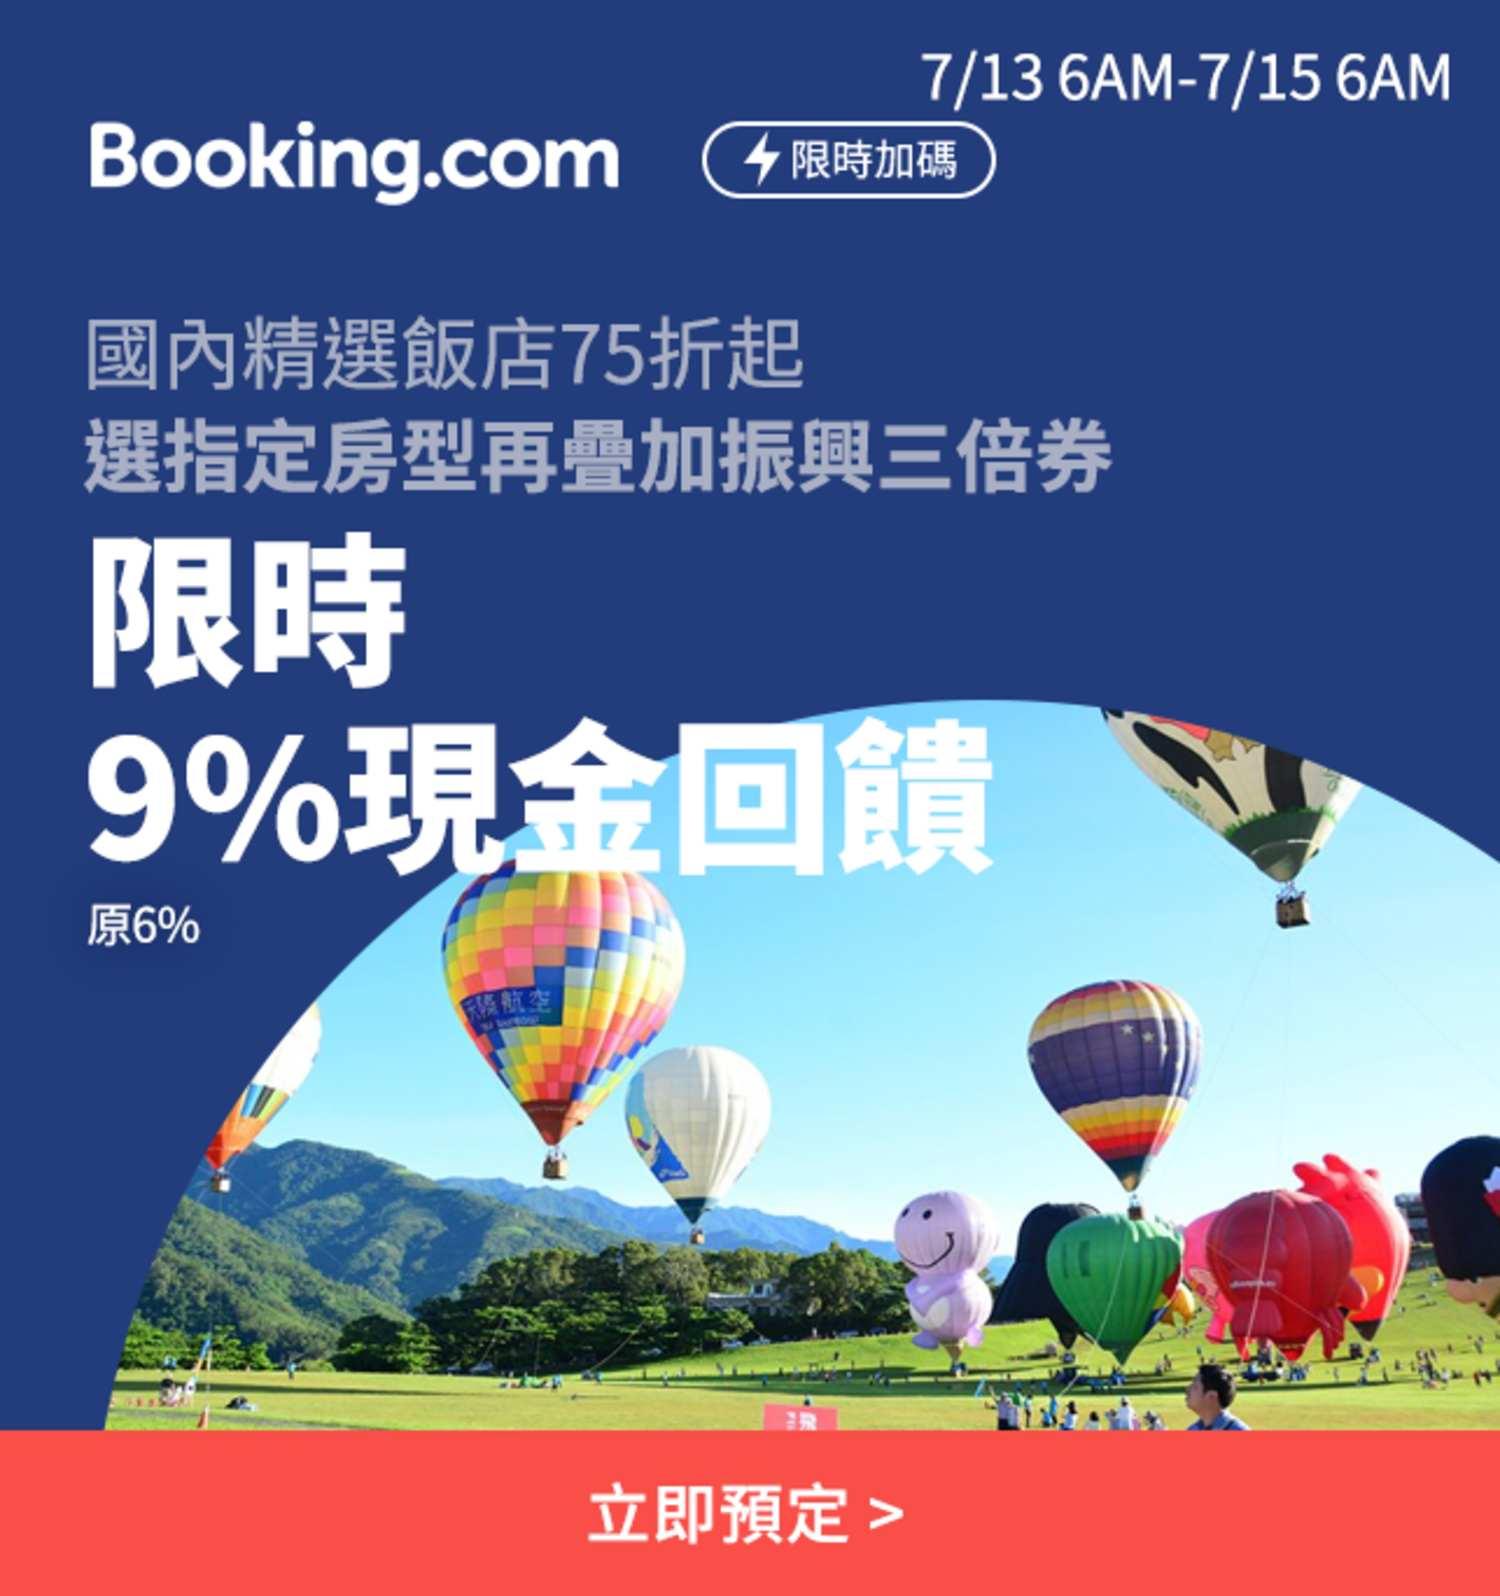 Booking.com 7/13 6AM-7/15 6AM